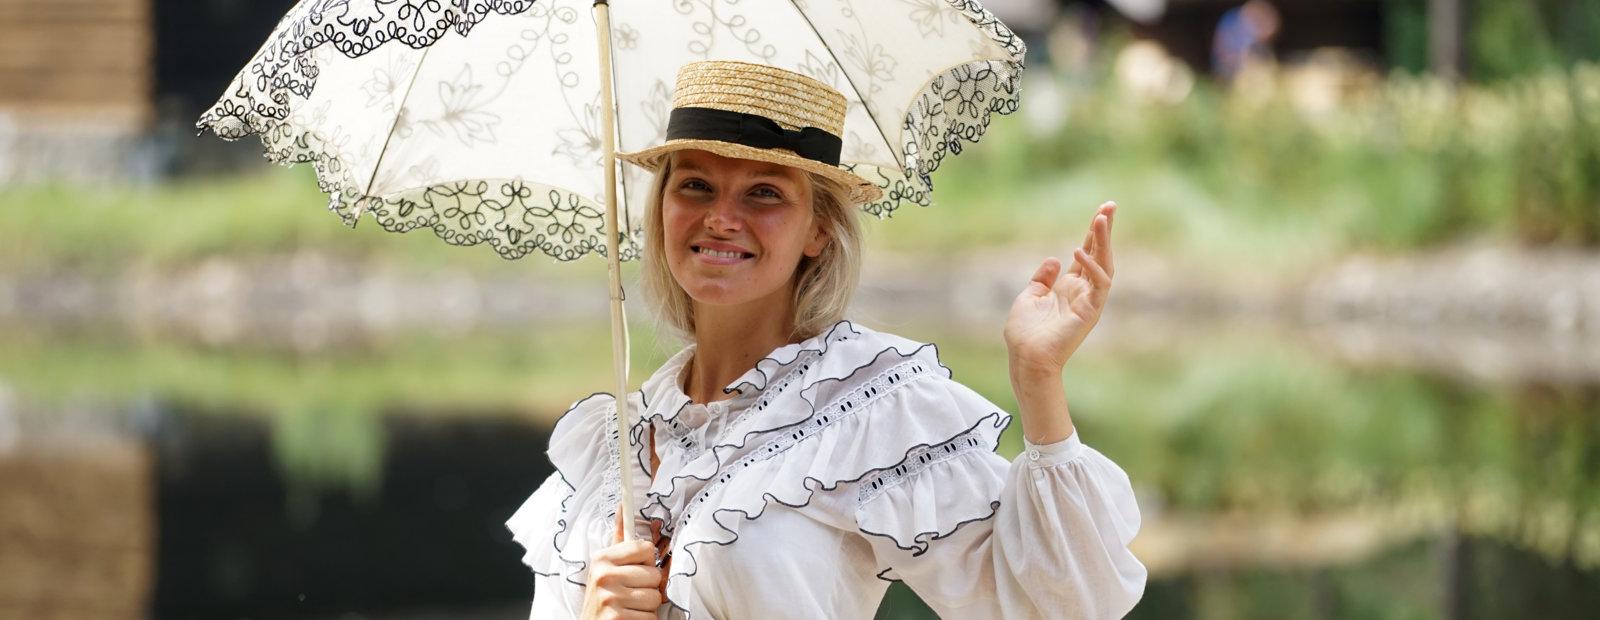 Fine English lady with umbrella.